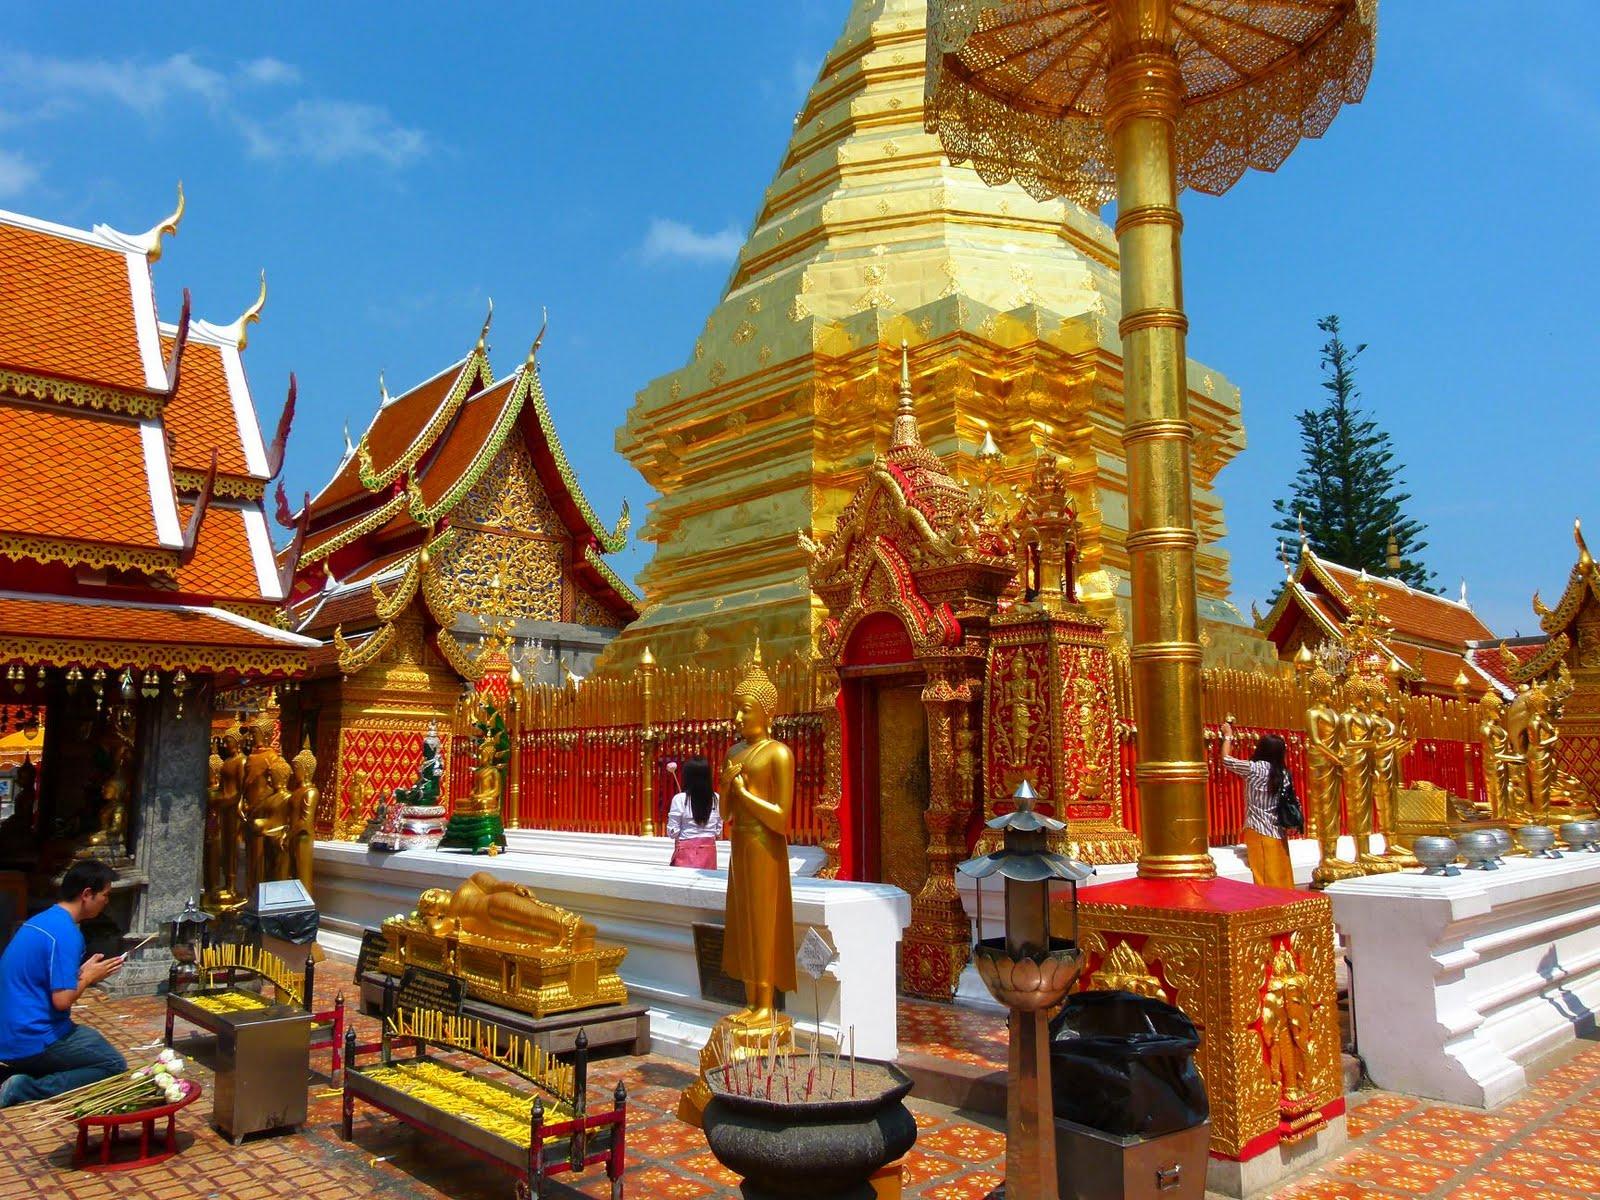 Interior of Wat Phrathat Doi Suthep